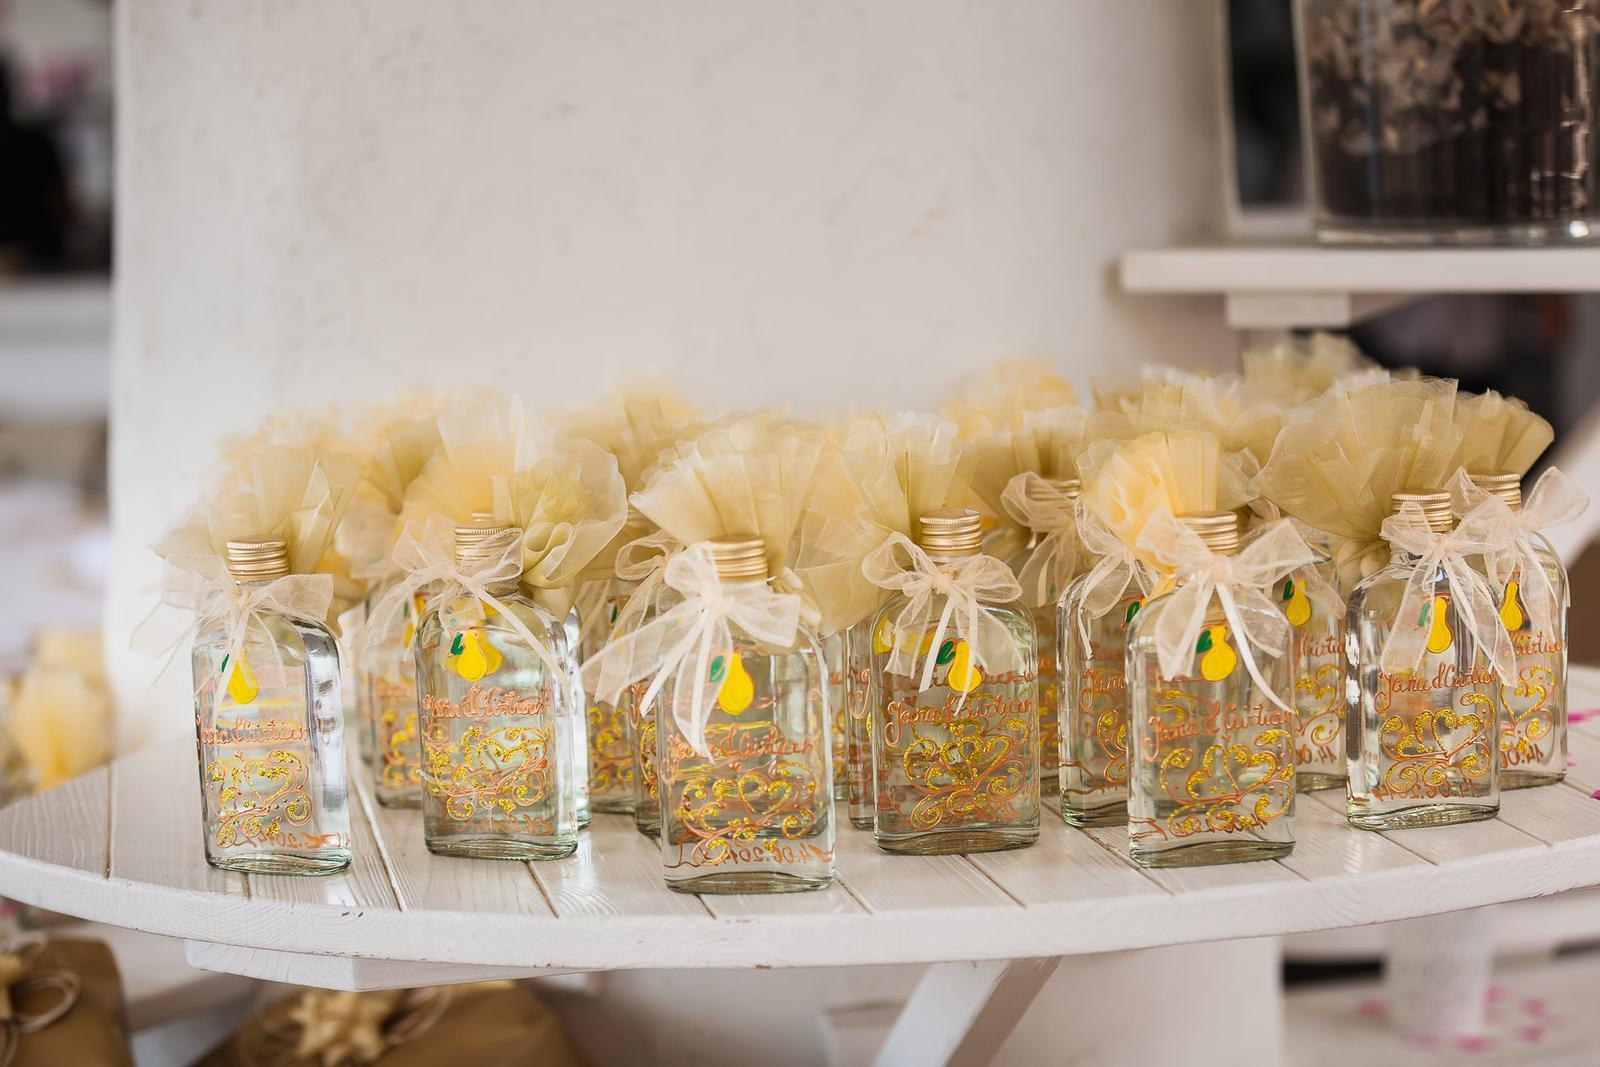 Dareky na svadby, svadobn dareky